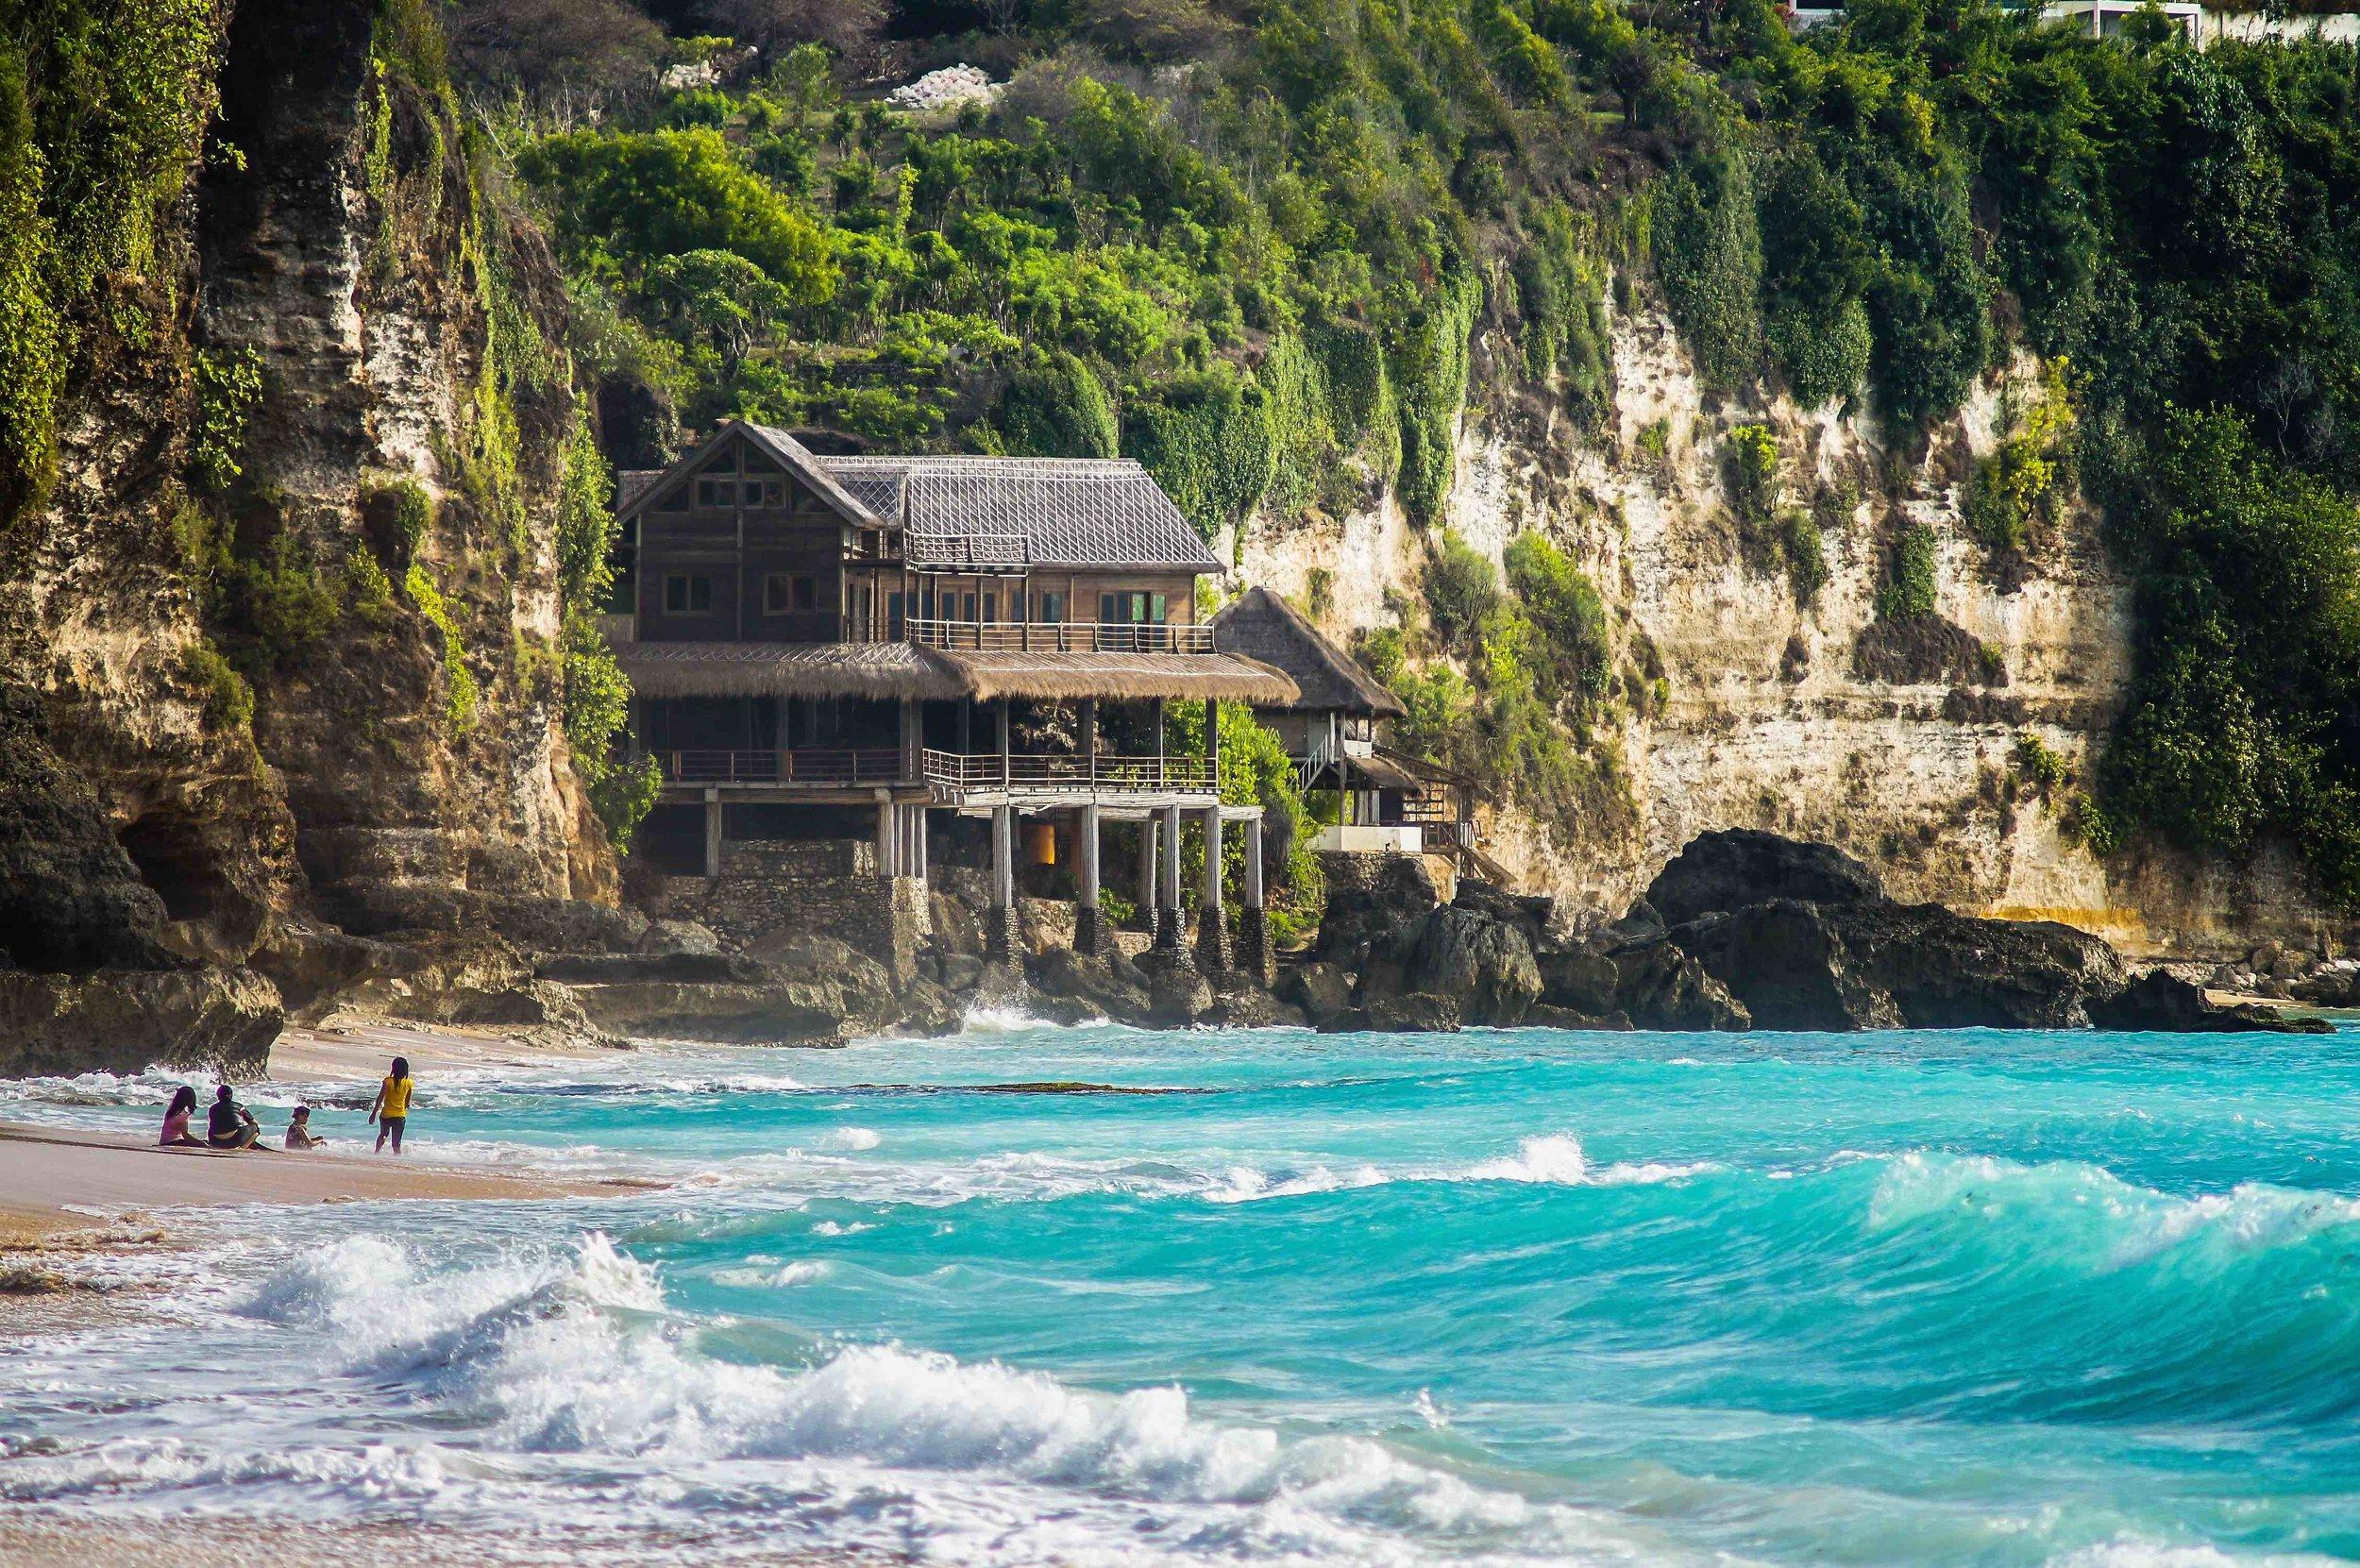 Stroll down to the beaches of Uluwatu